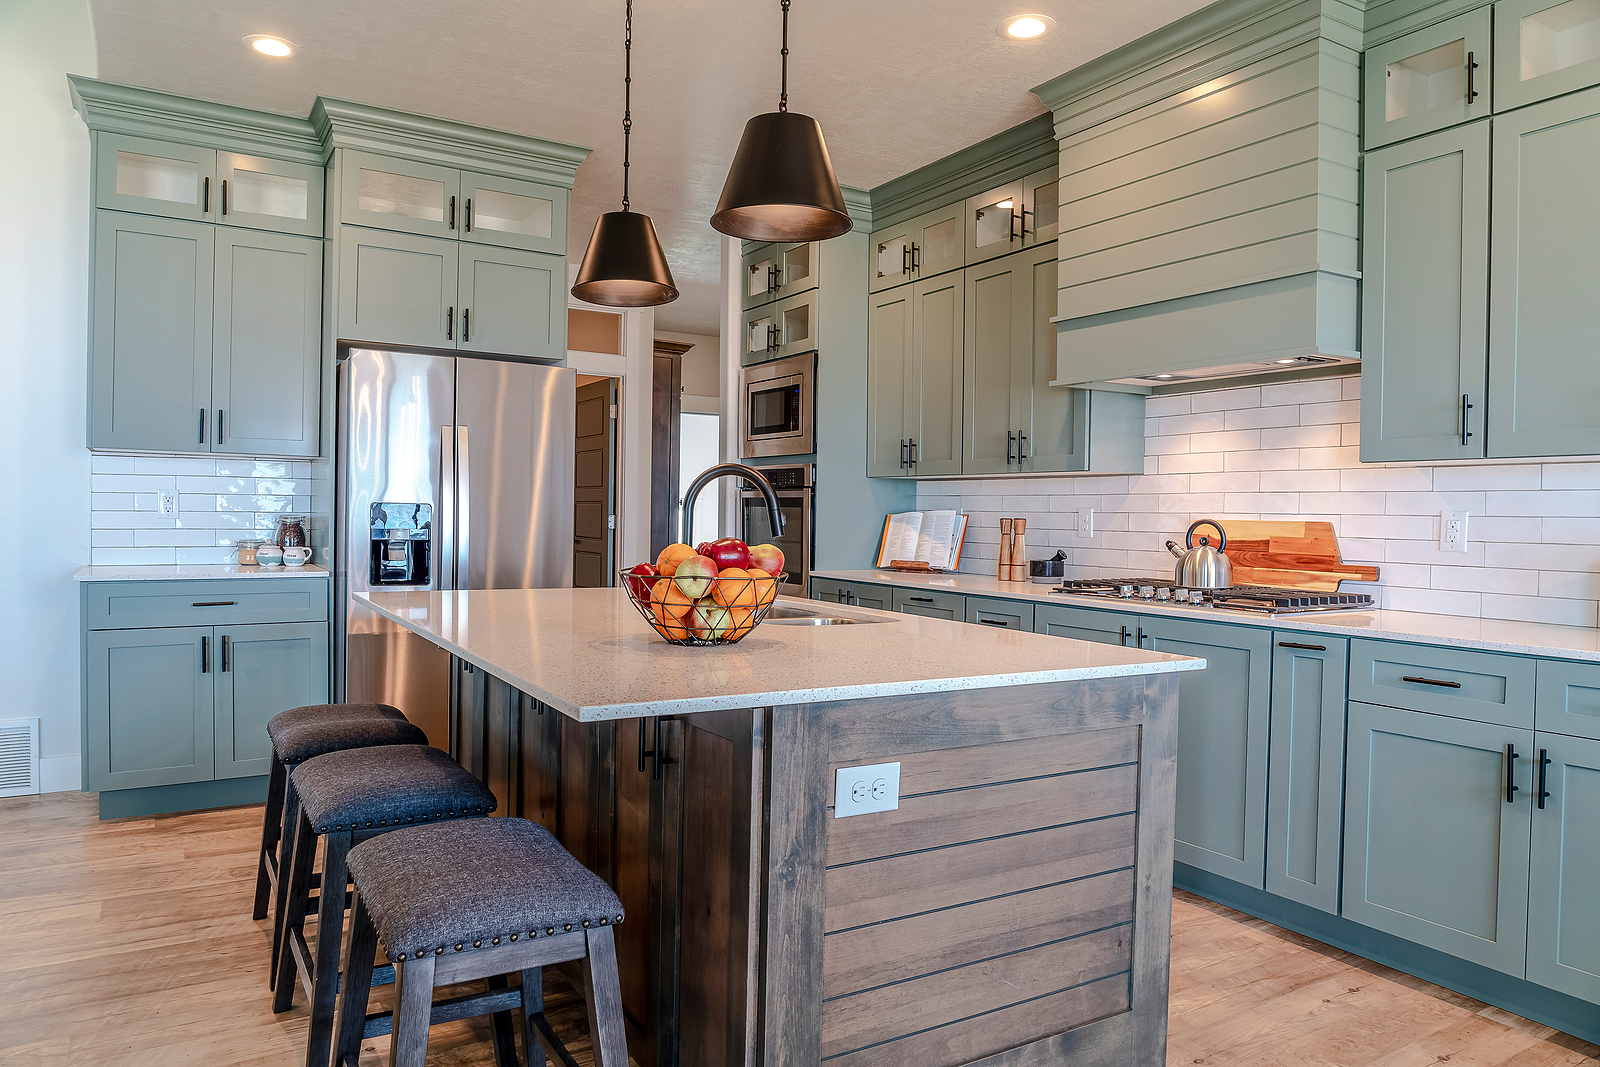 bigstock-kitchen-island-with-cushioned-401648630.jpg